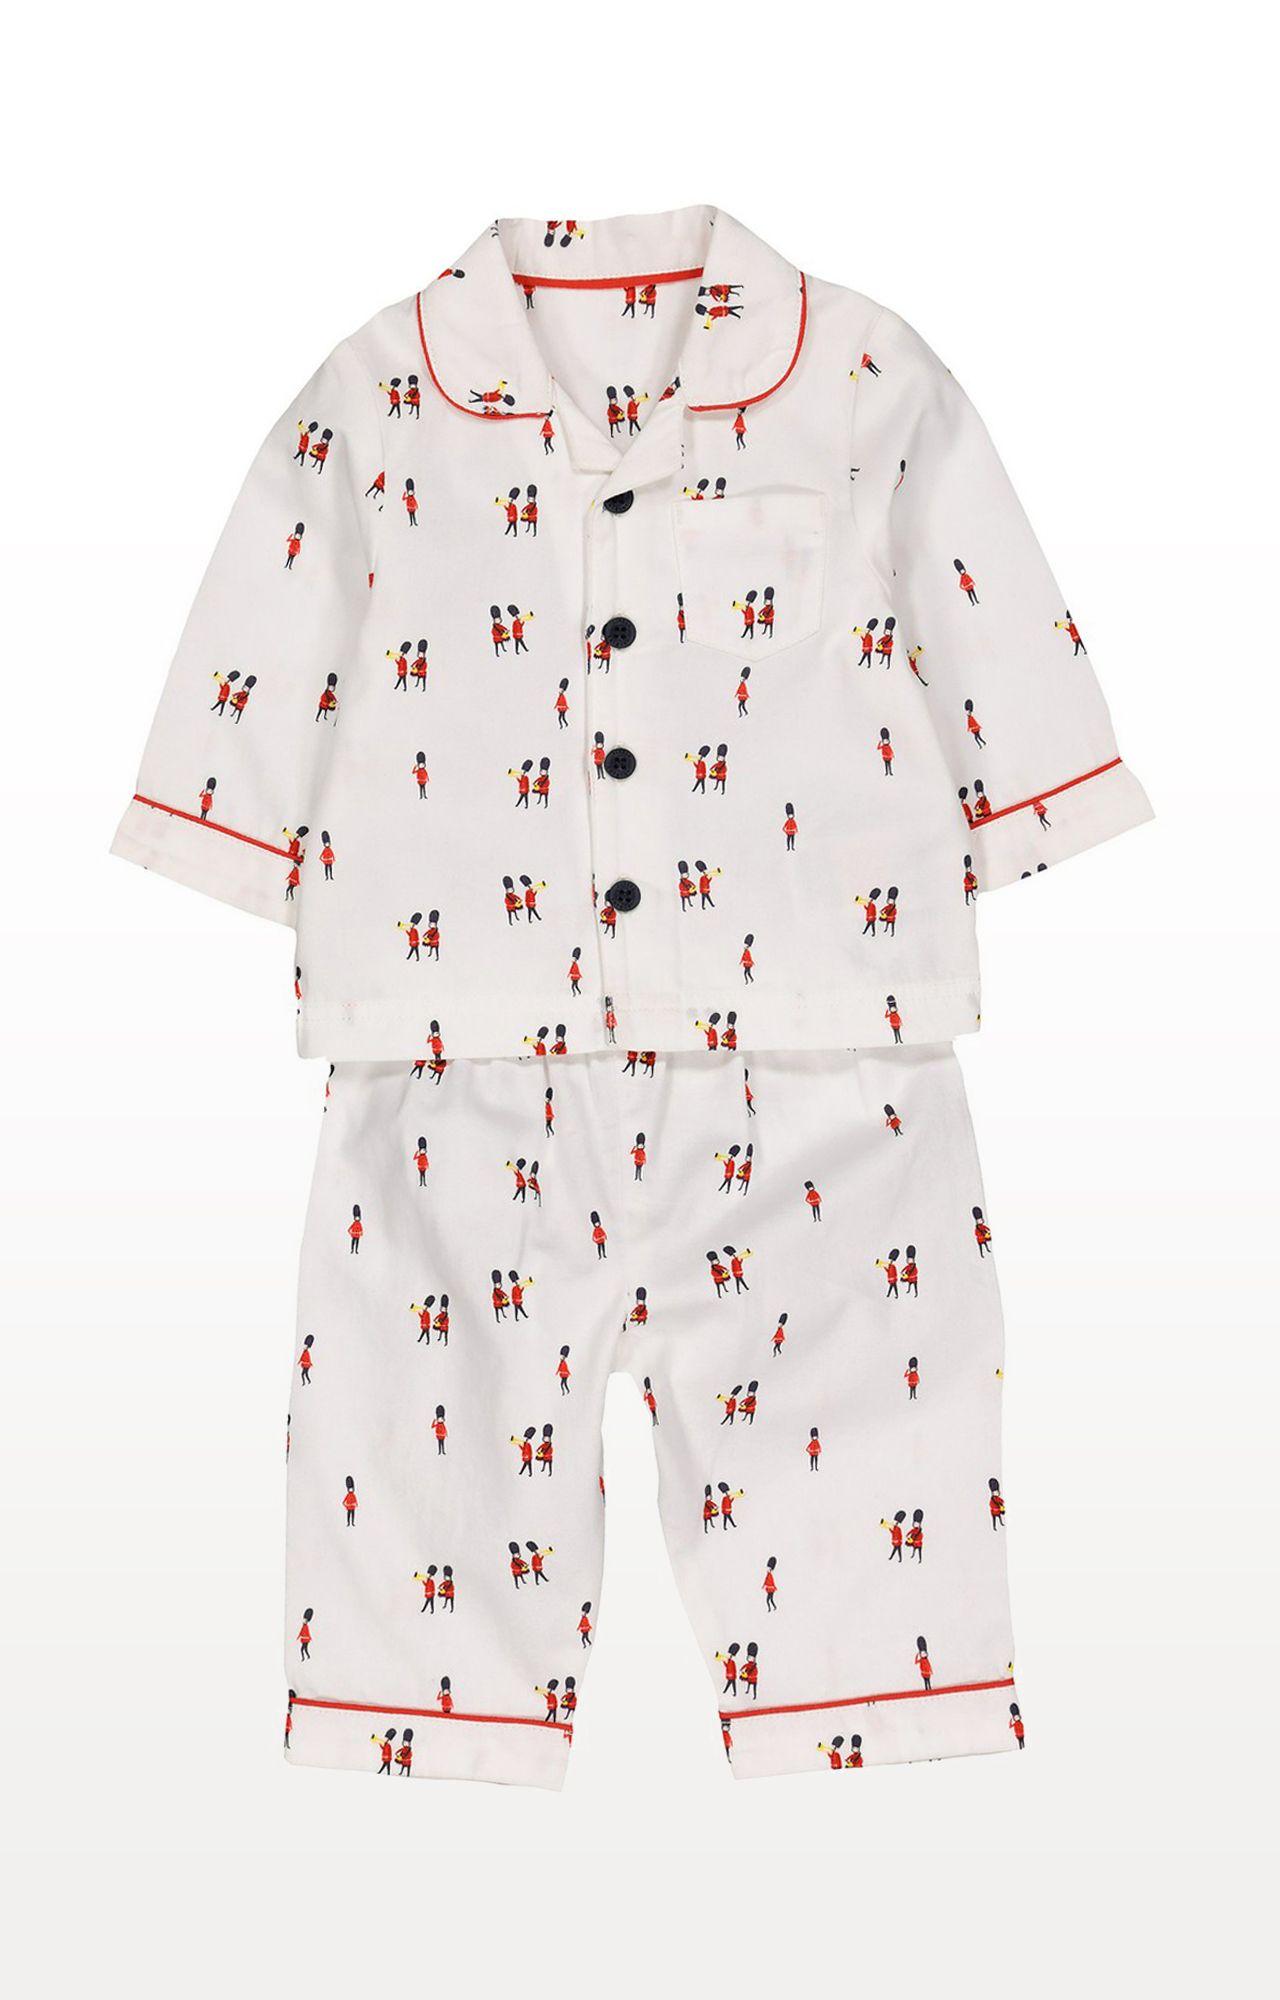 Mothercare | White Printed Toy Soldier Pyjamas